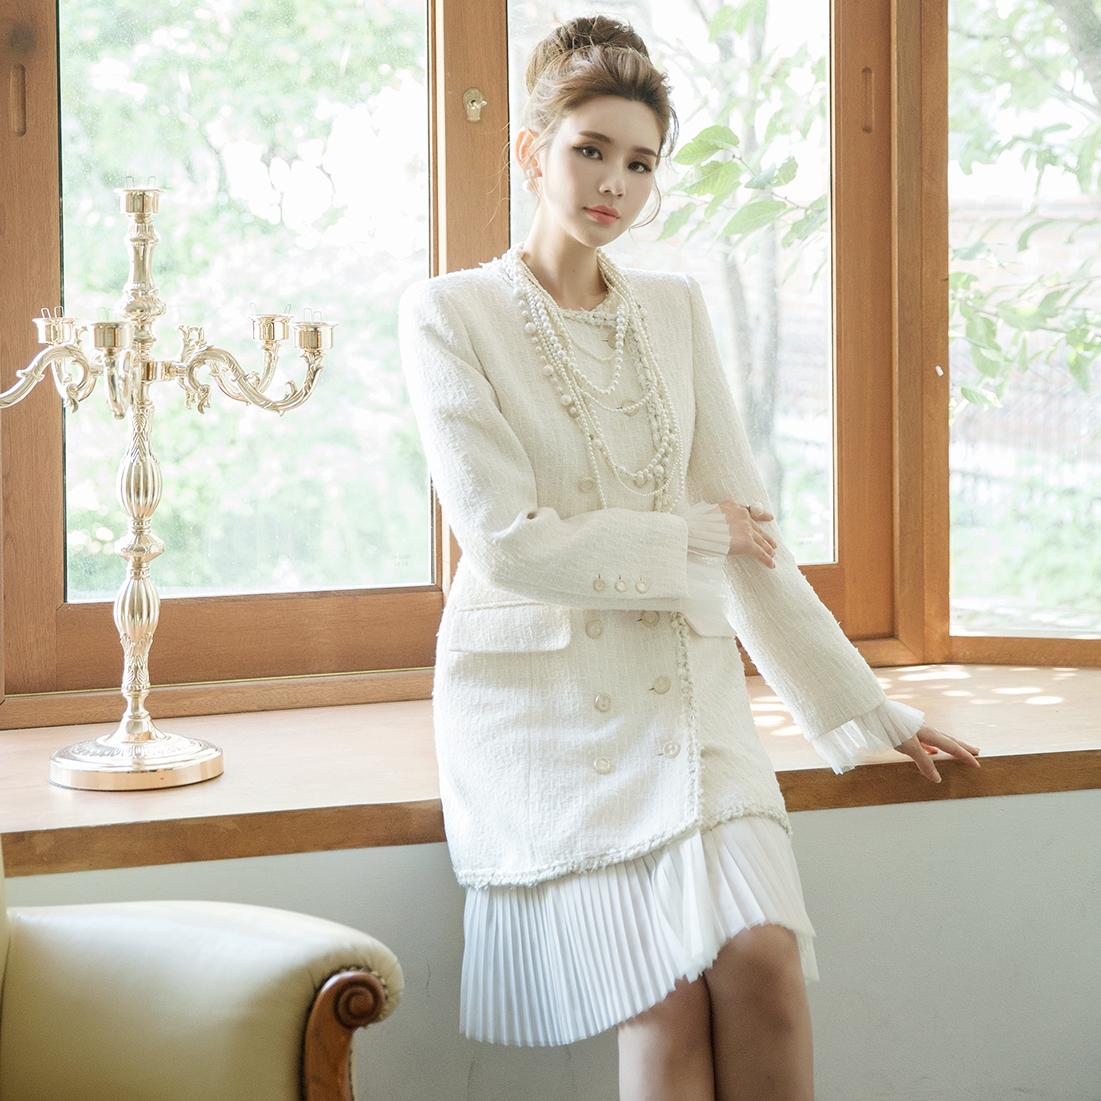 J736 浪漫雪纺百褶粗花呢长版夹克 *能用以连身裙着用*